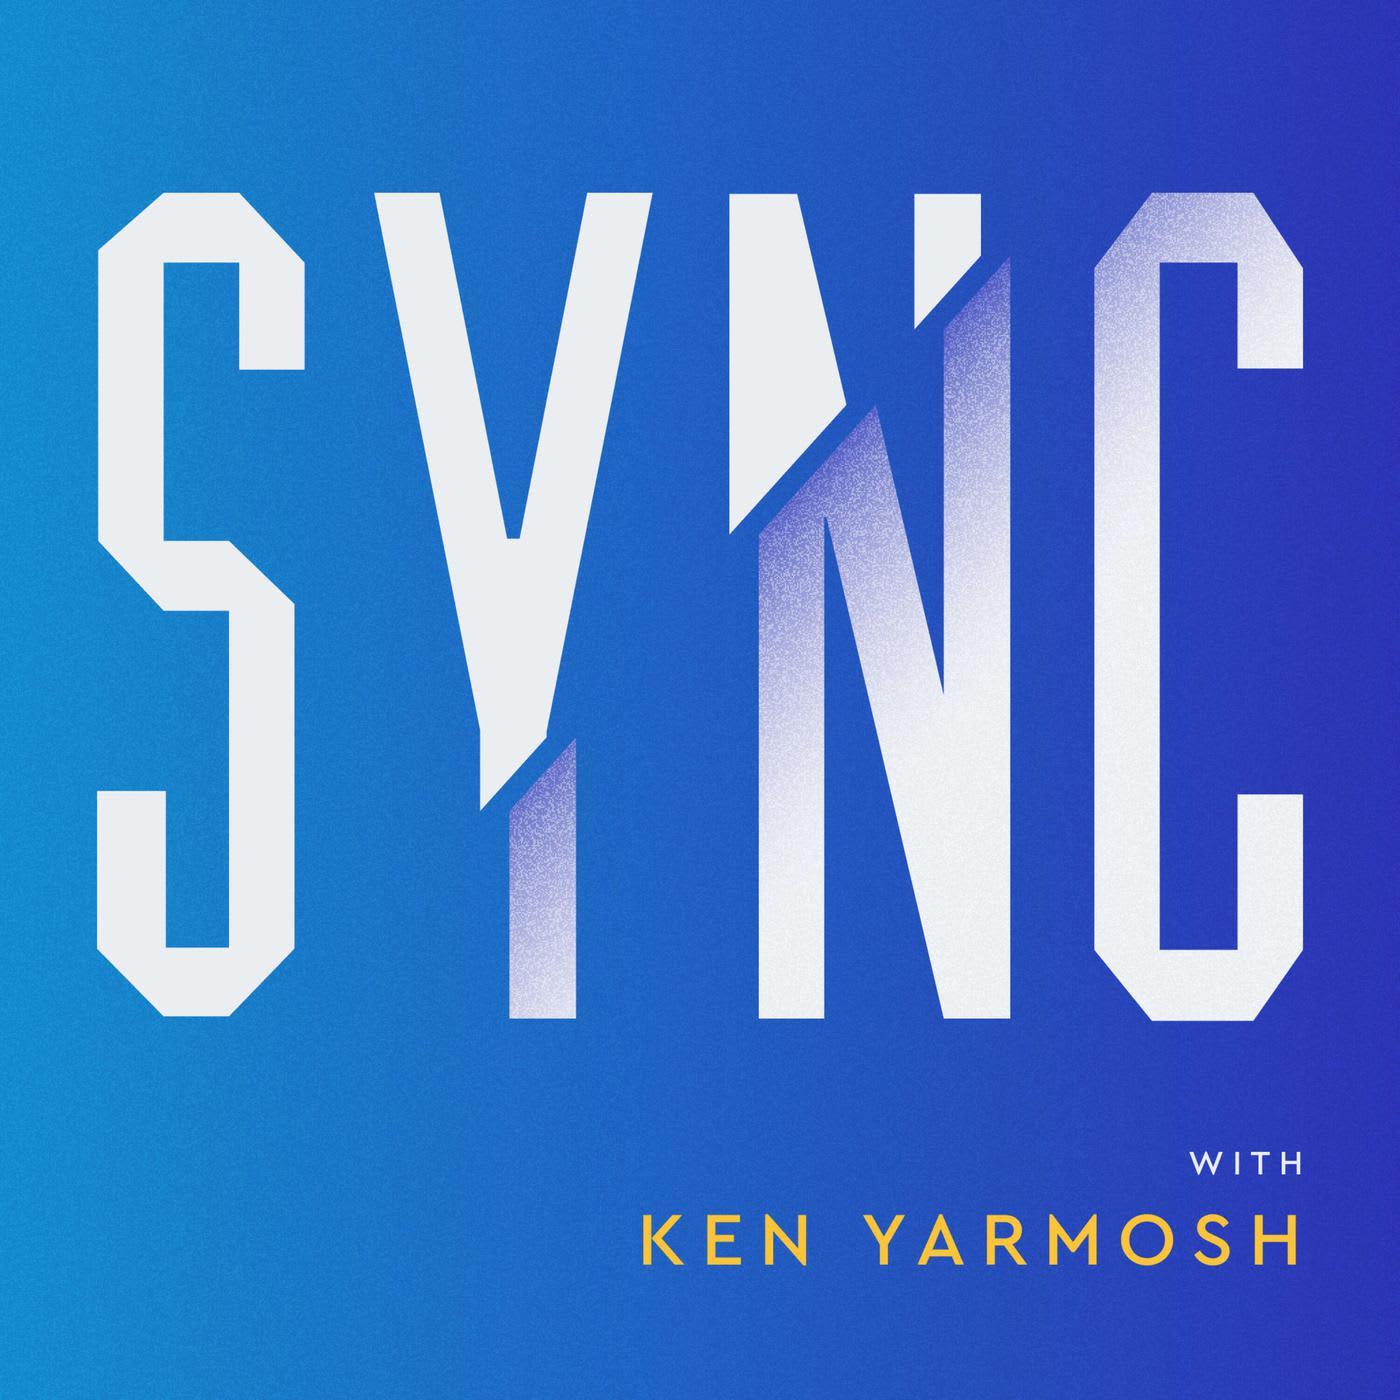 Ken Yarmosh's Sync Podcast